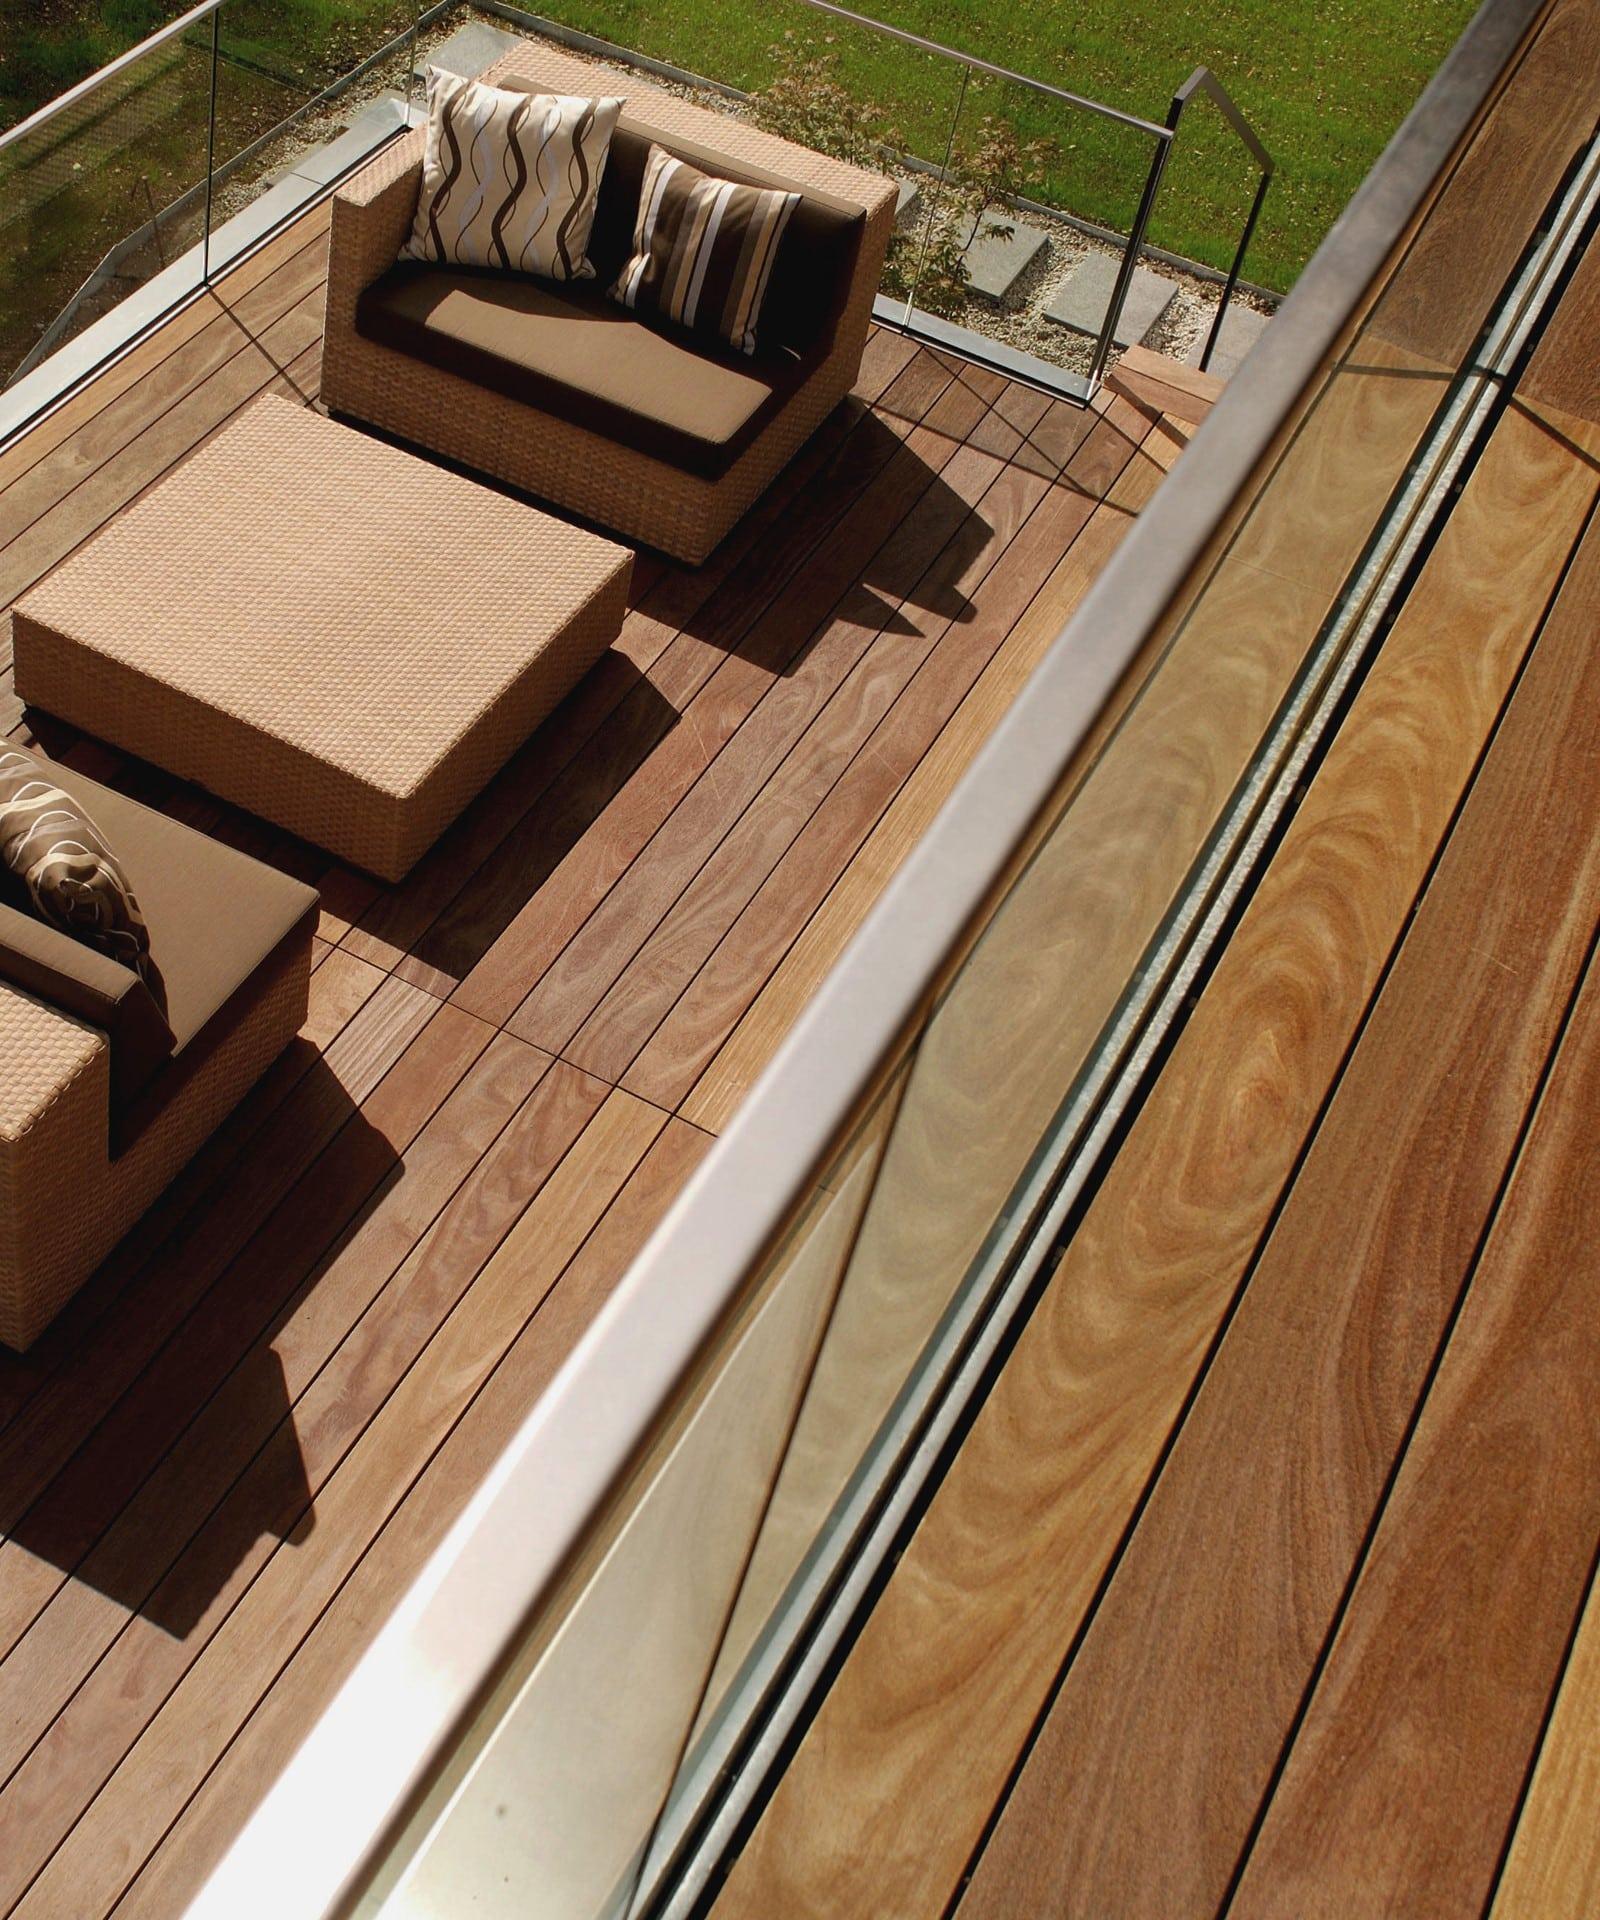 Cumaru Terrassendielen Kaufen 120mm Glatt Gehobelt Fsc 100